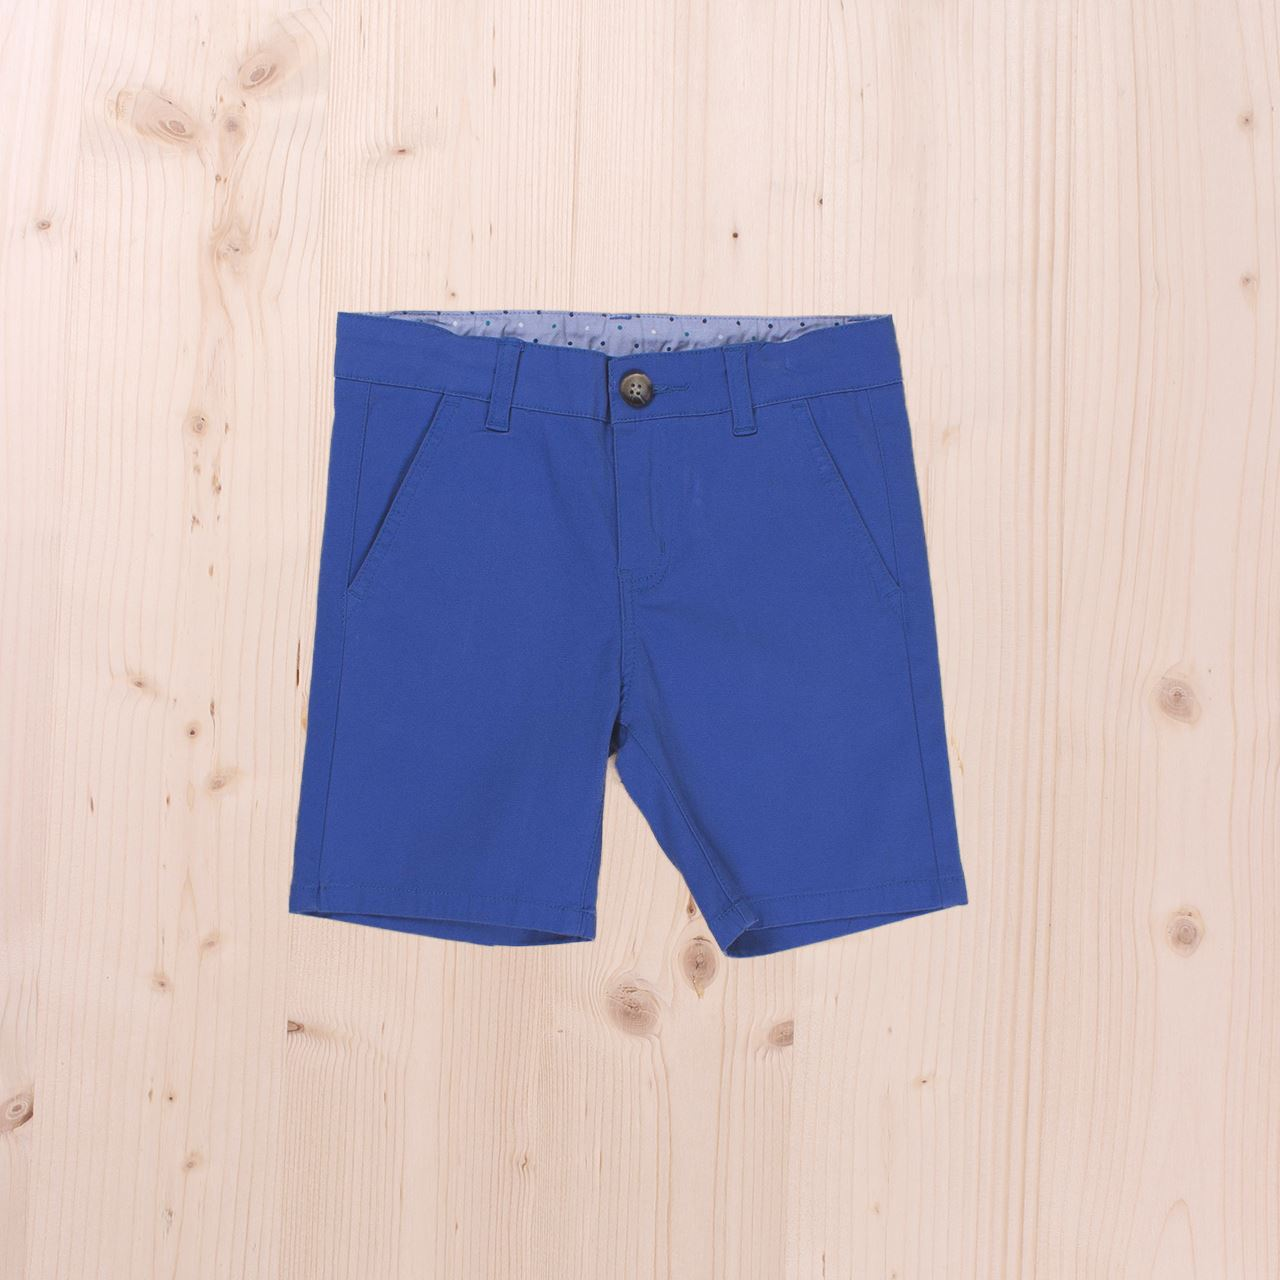 96089990e Pantalón azul niño junior. Dadati - Moda infantil